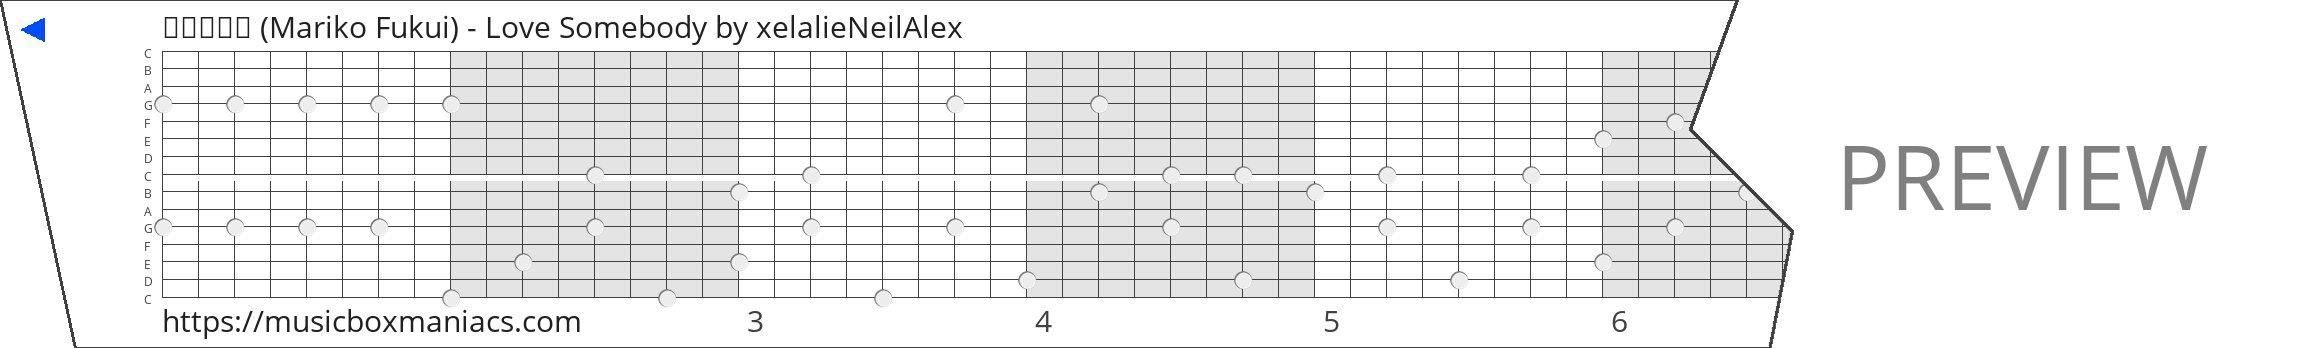 福井麻利子 (Mariko Fukui) - Love Somebody 15 note music box paper strip